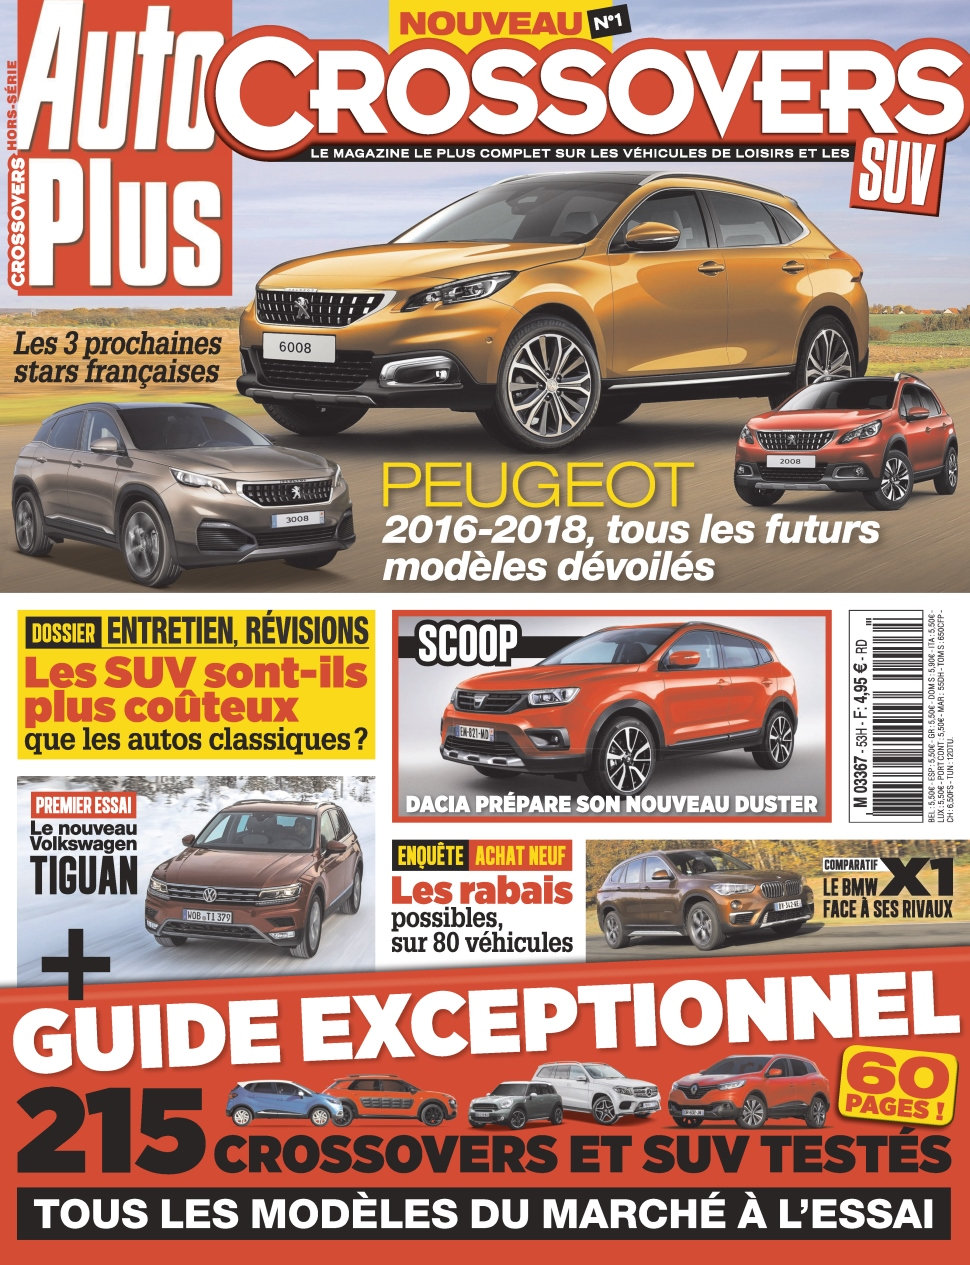 Auto Plus Hors Série Crossovers N°1 - 2016